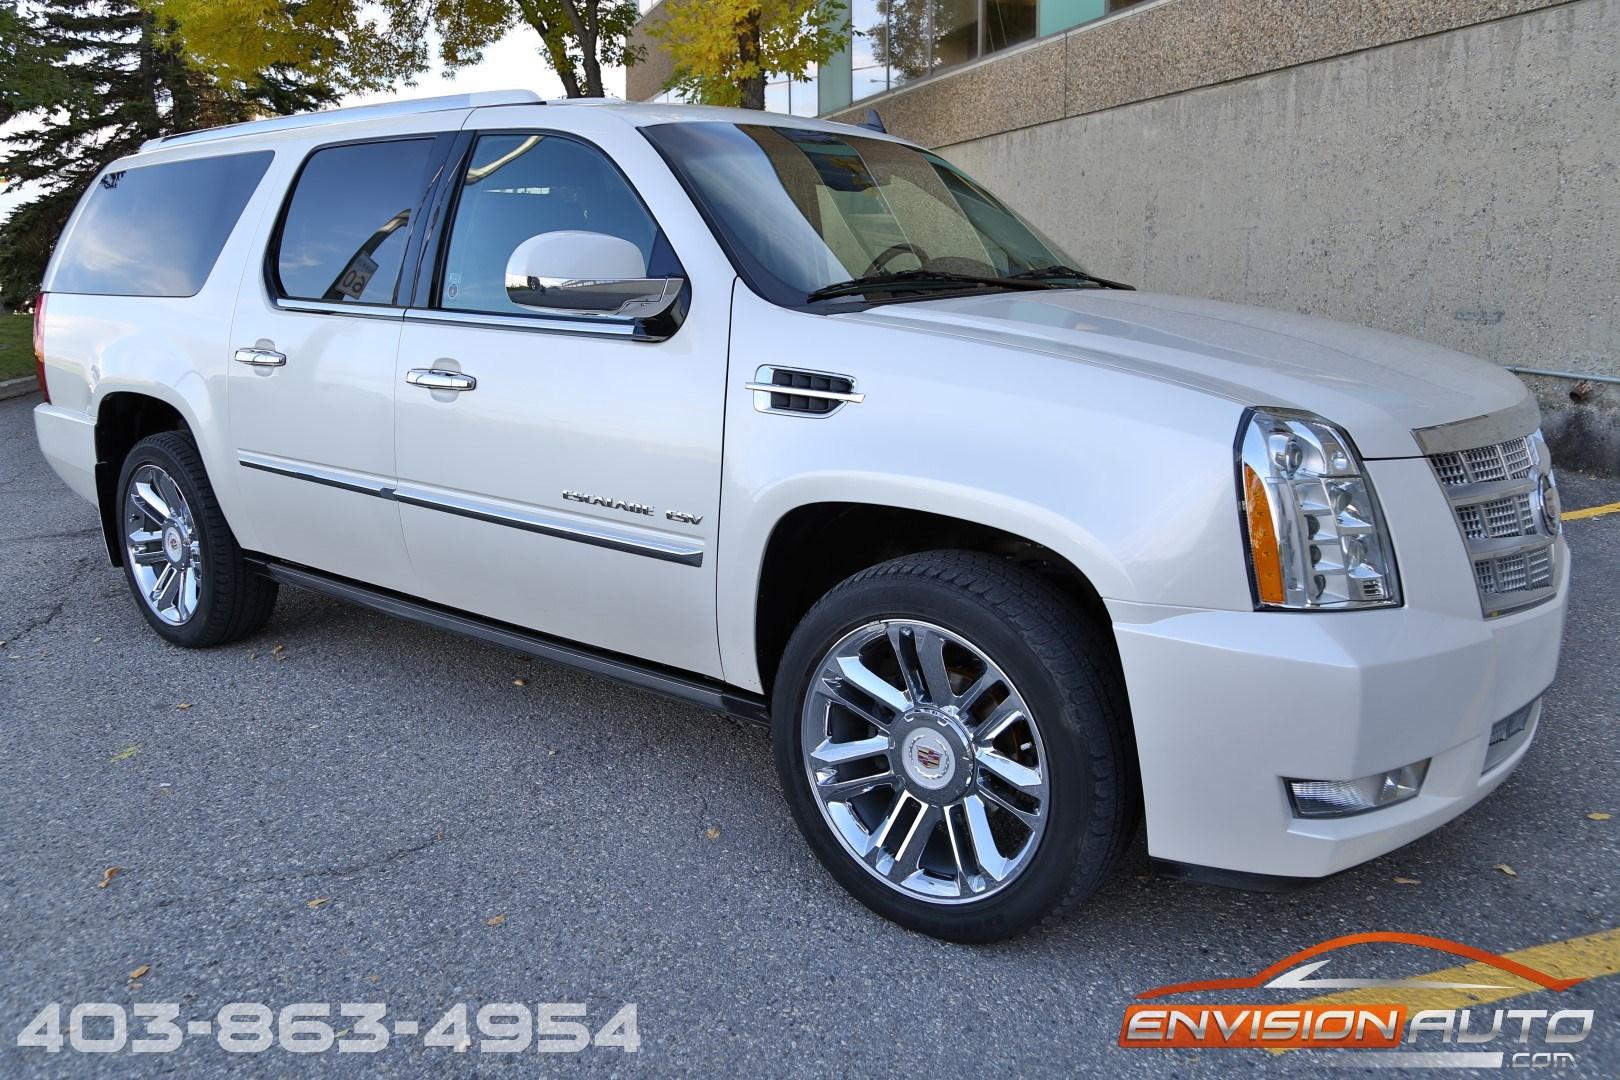 2013 Cadillac Escalade Esv Platinum Edition Loaded Envision Auto 200 Image For